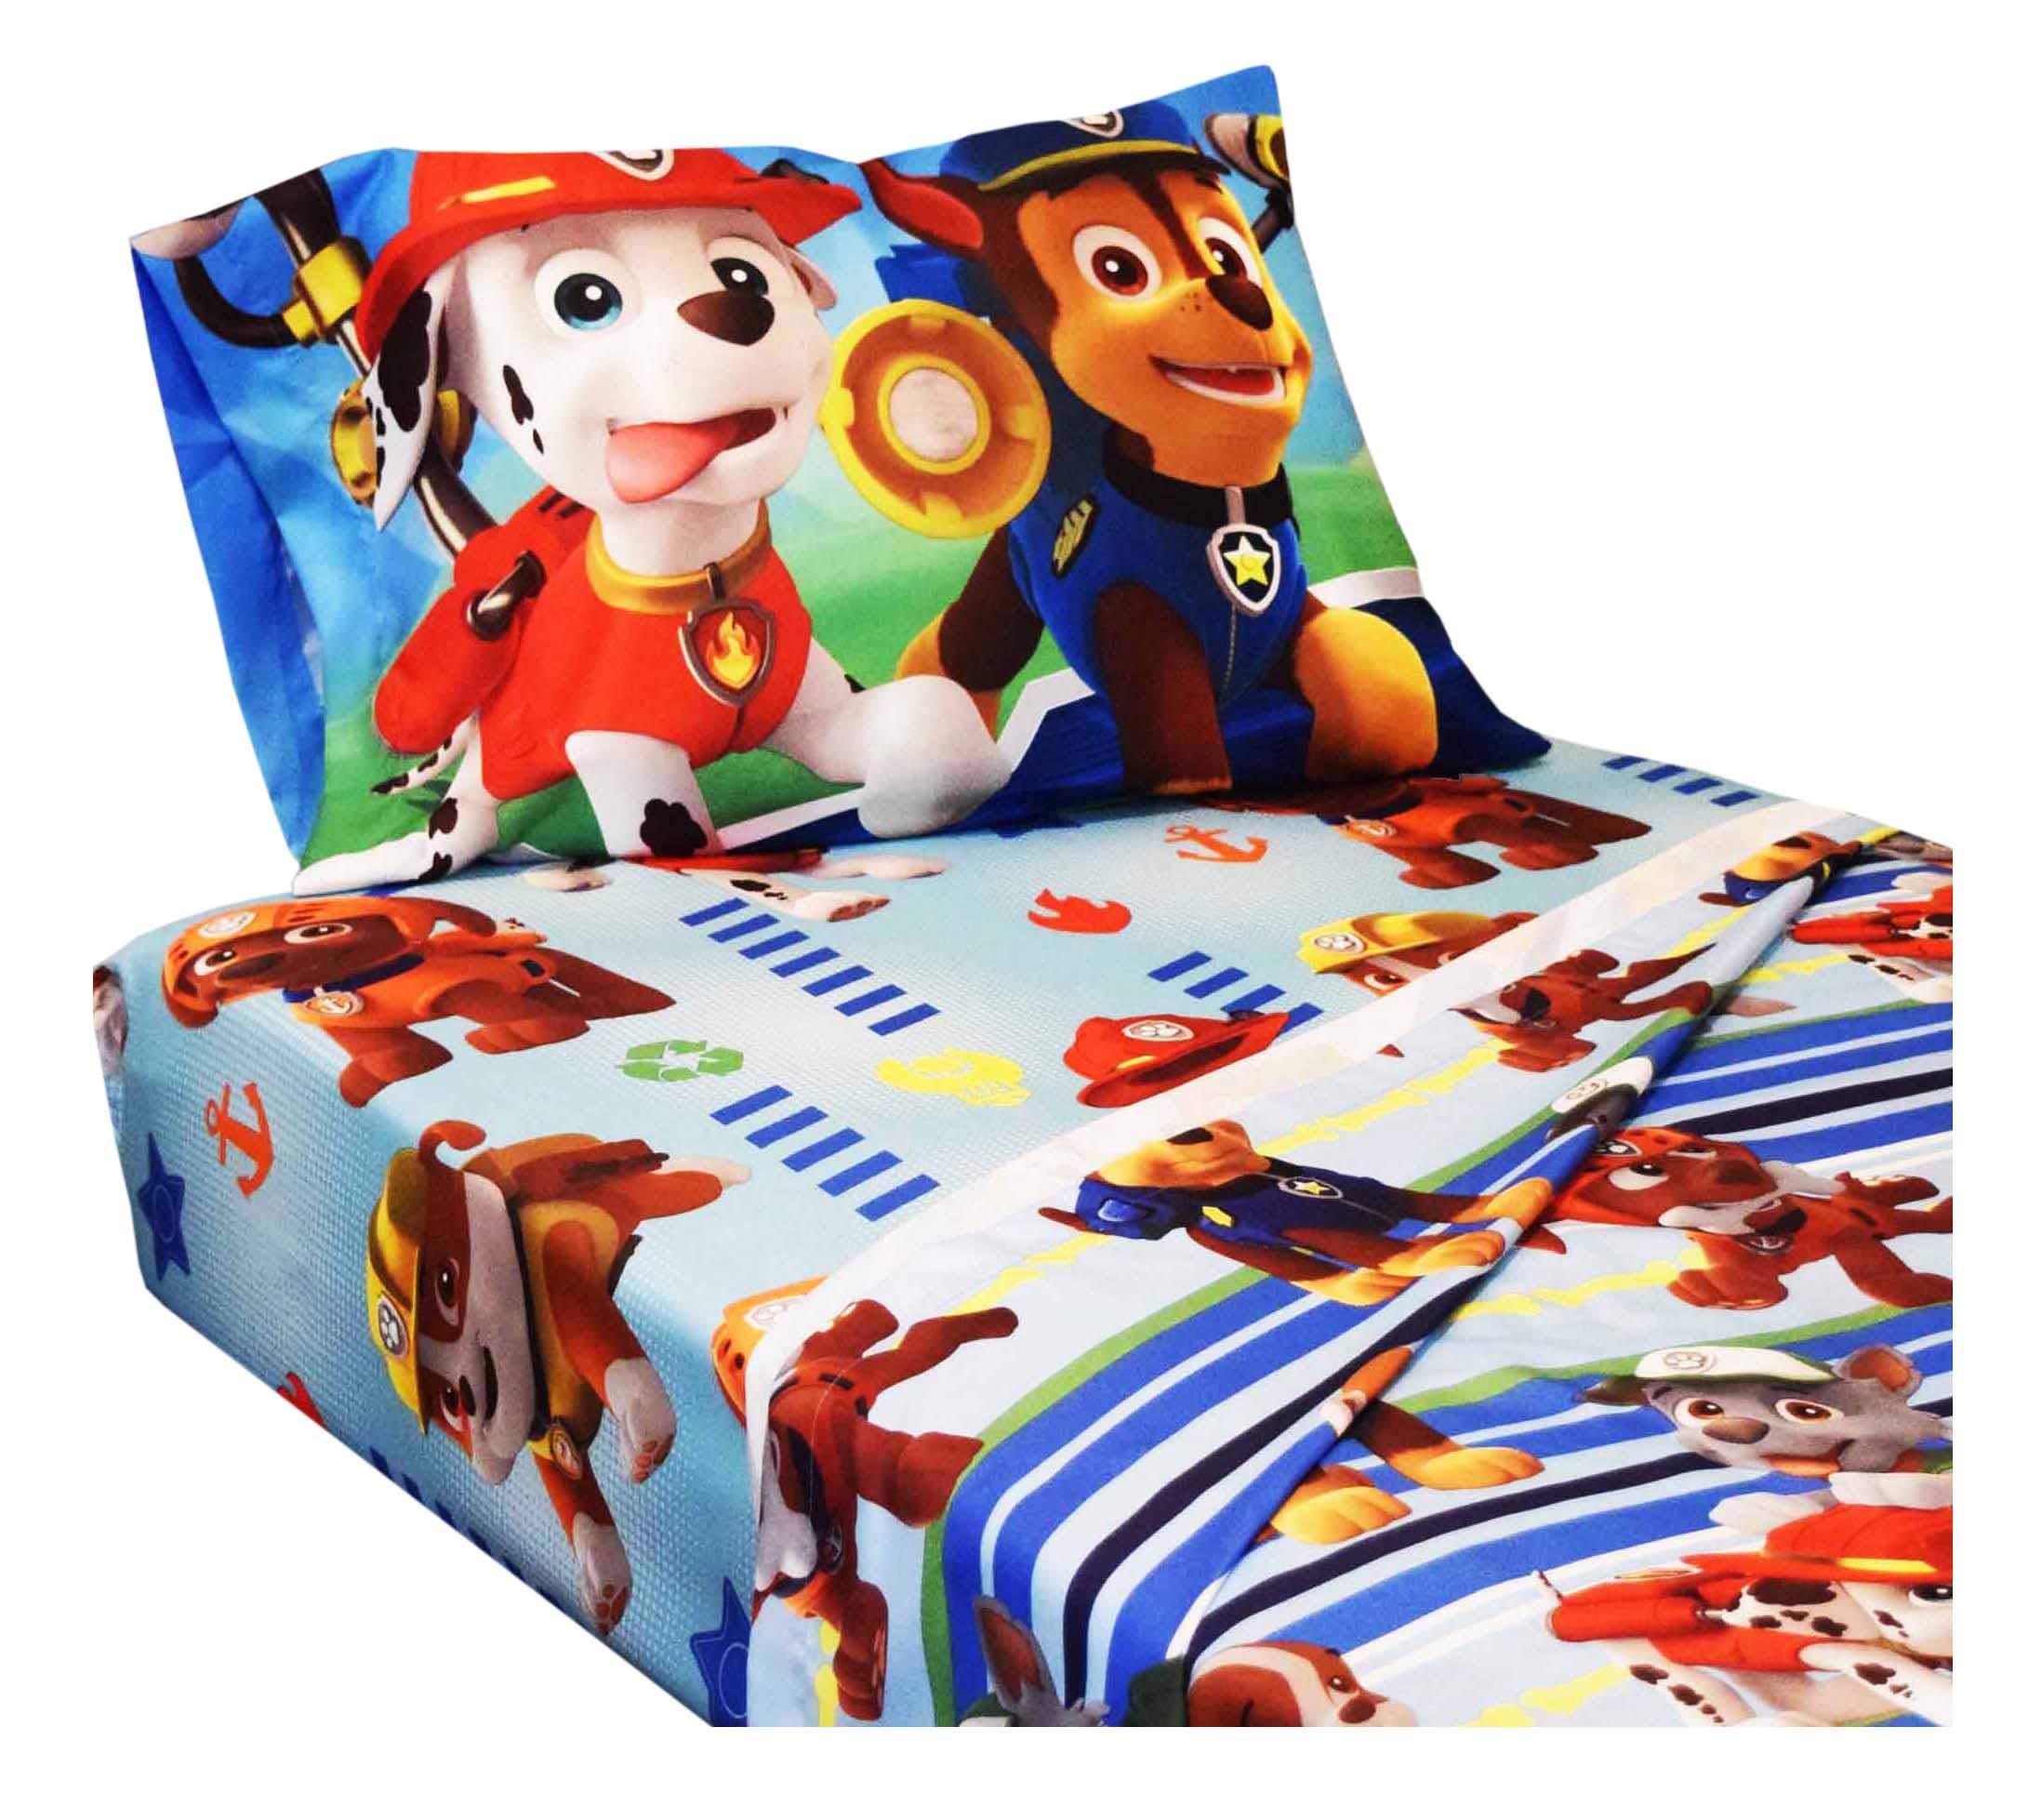 Kohl's Paw Patrol 4 Piece Full Bed Sheets - Chase, Marshall, Rubble, Zuma - Kids Microfiber Bedding Set